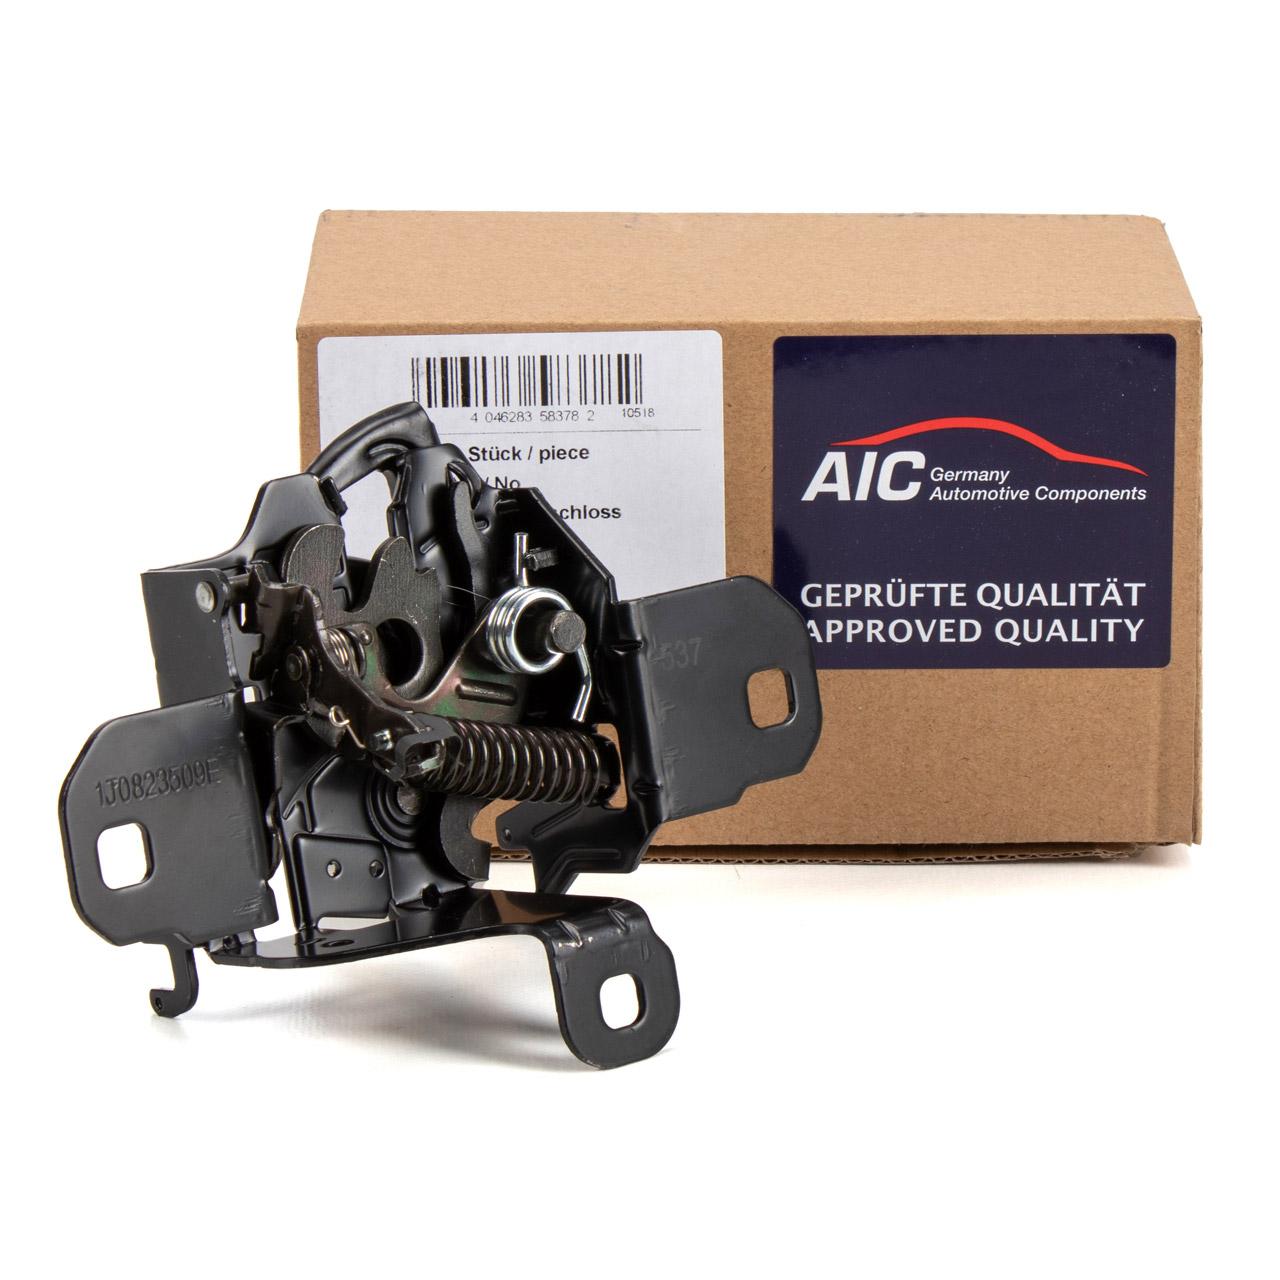 AIC 58378 Motorhaubenschloss Haubenschloss VW Bora 1 1J2 1J6 Golf 4 1J2 1J5 1J0823509C